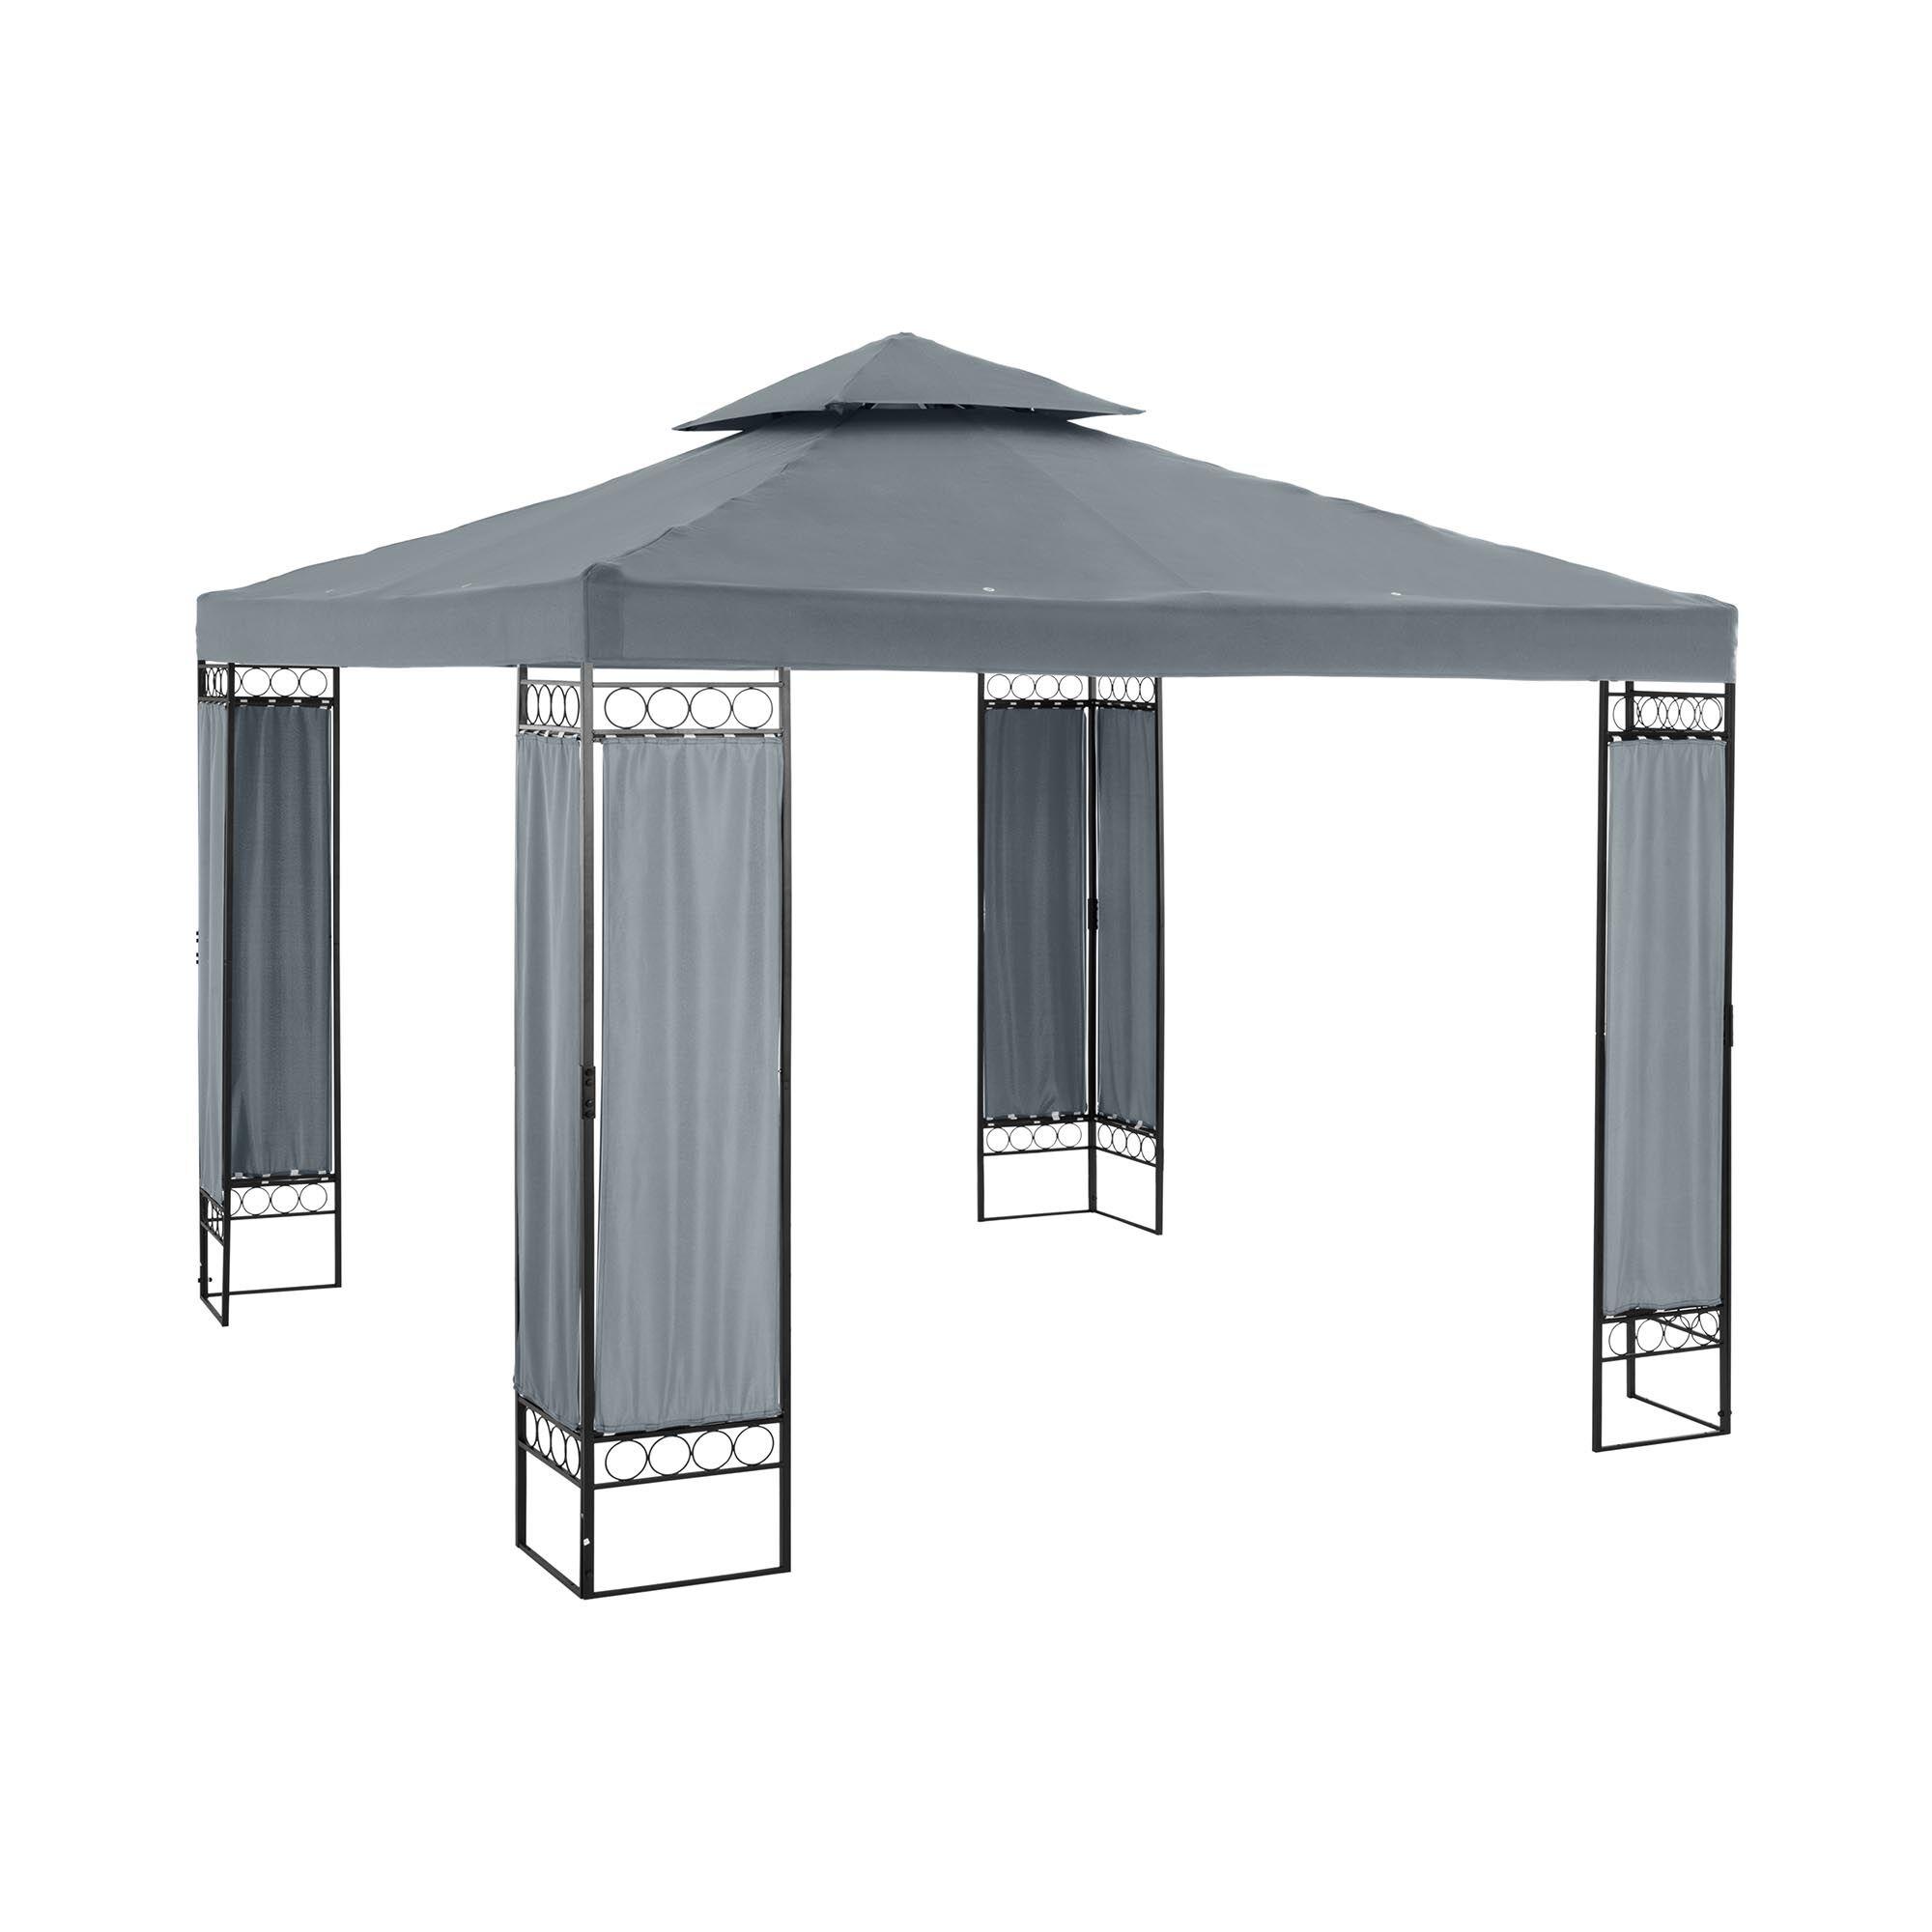 Uniprodo Patio Gazebo - 3 x 3 m - 180 g/m² - dark grey